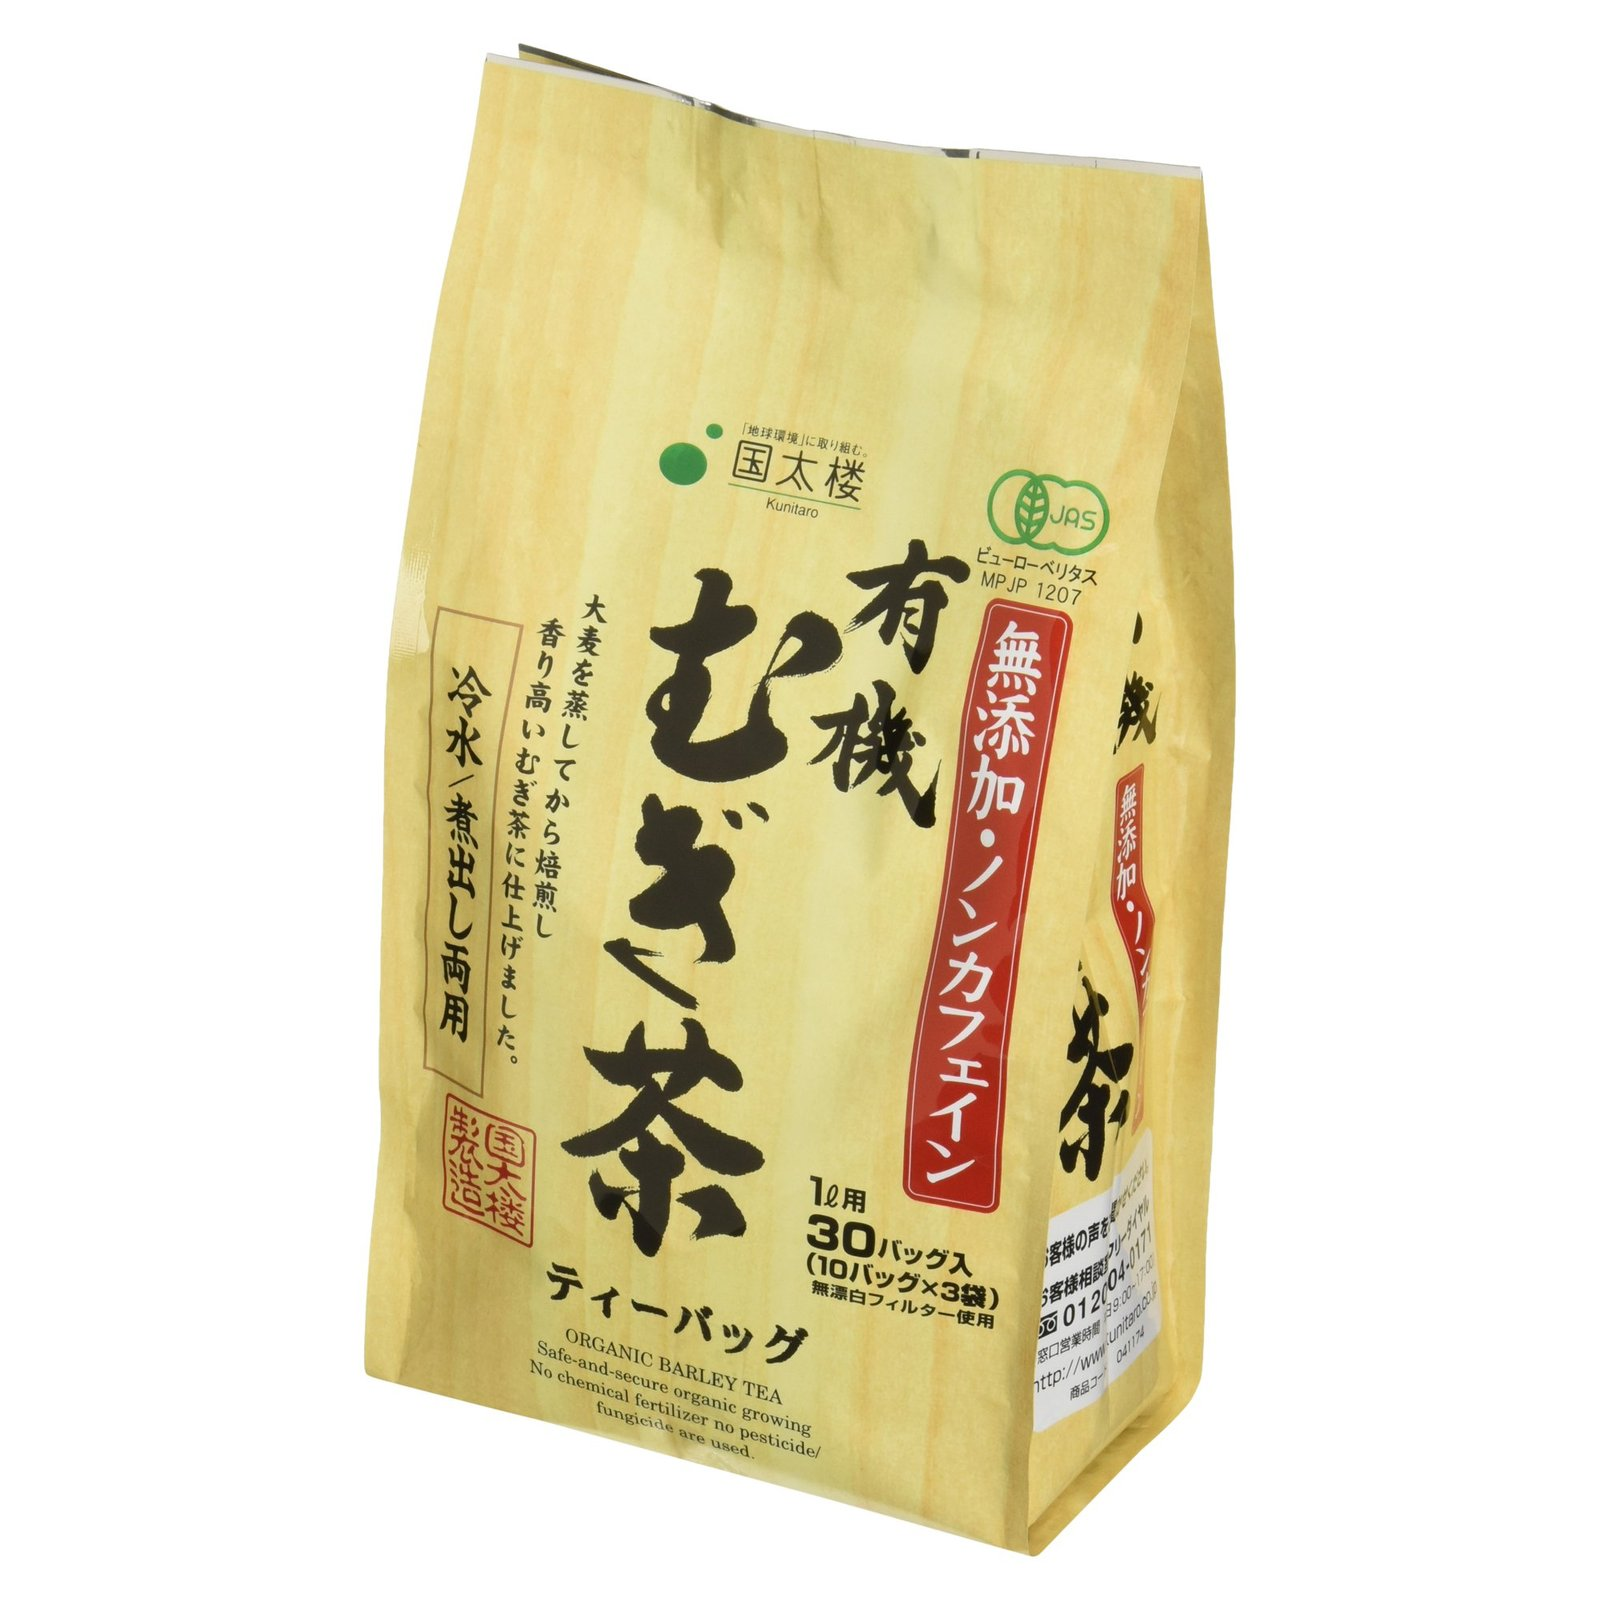 KuniFutoshi-ro organic barley tea 30P